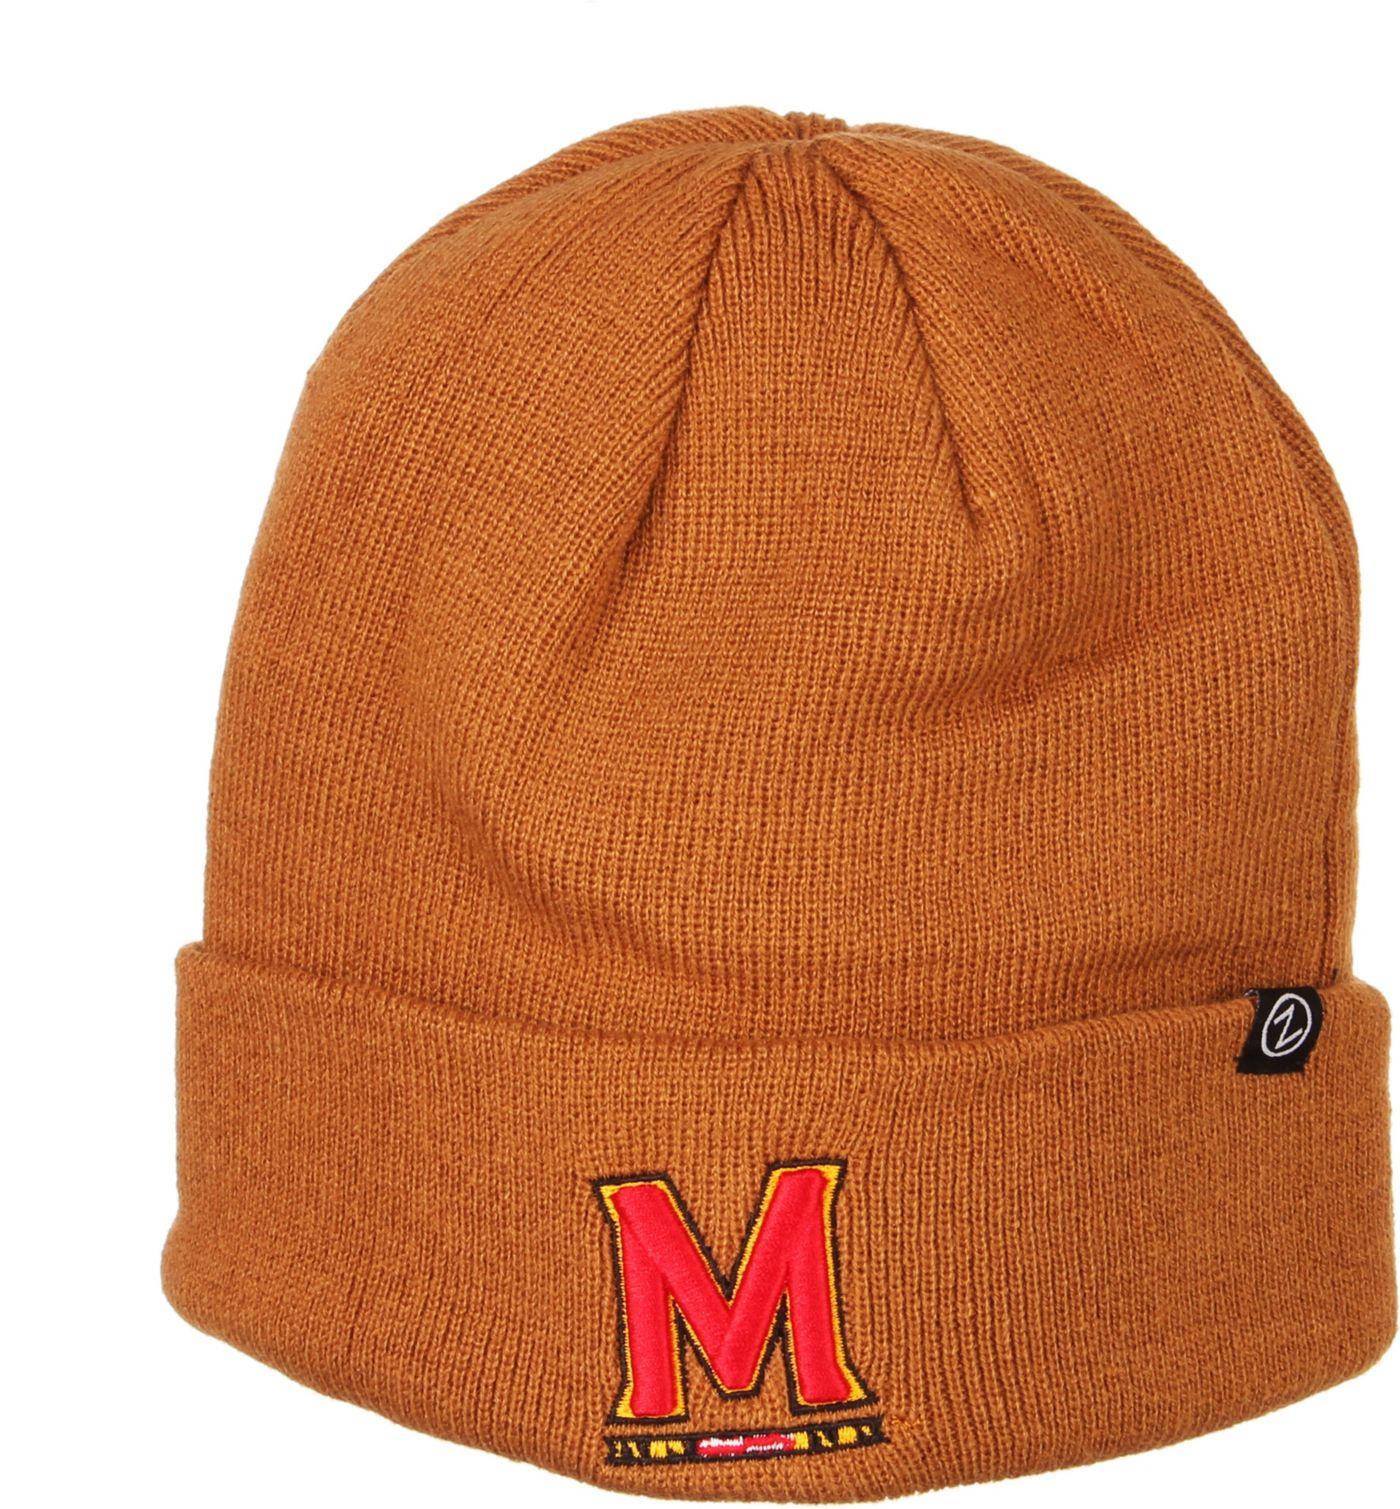 Zephyr Men's Maryland Terrapins Brown Cuffed Knit Beanie